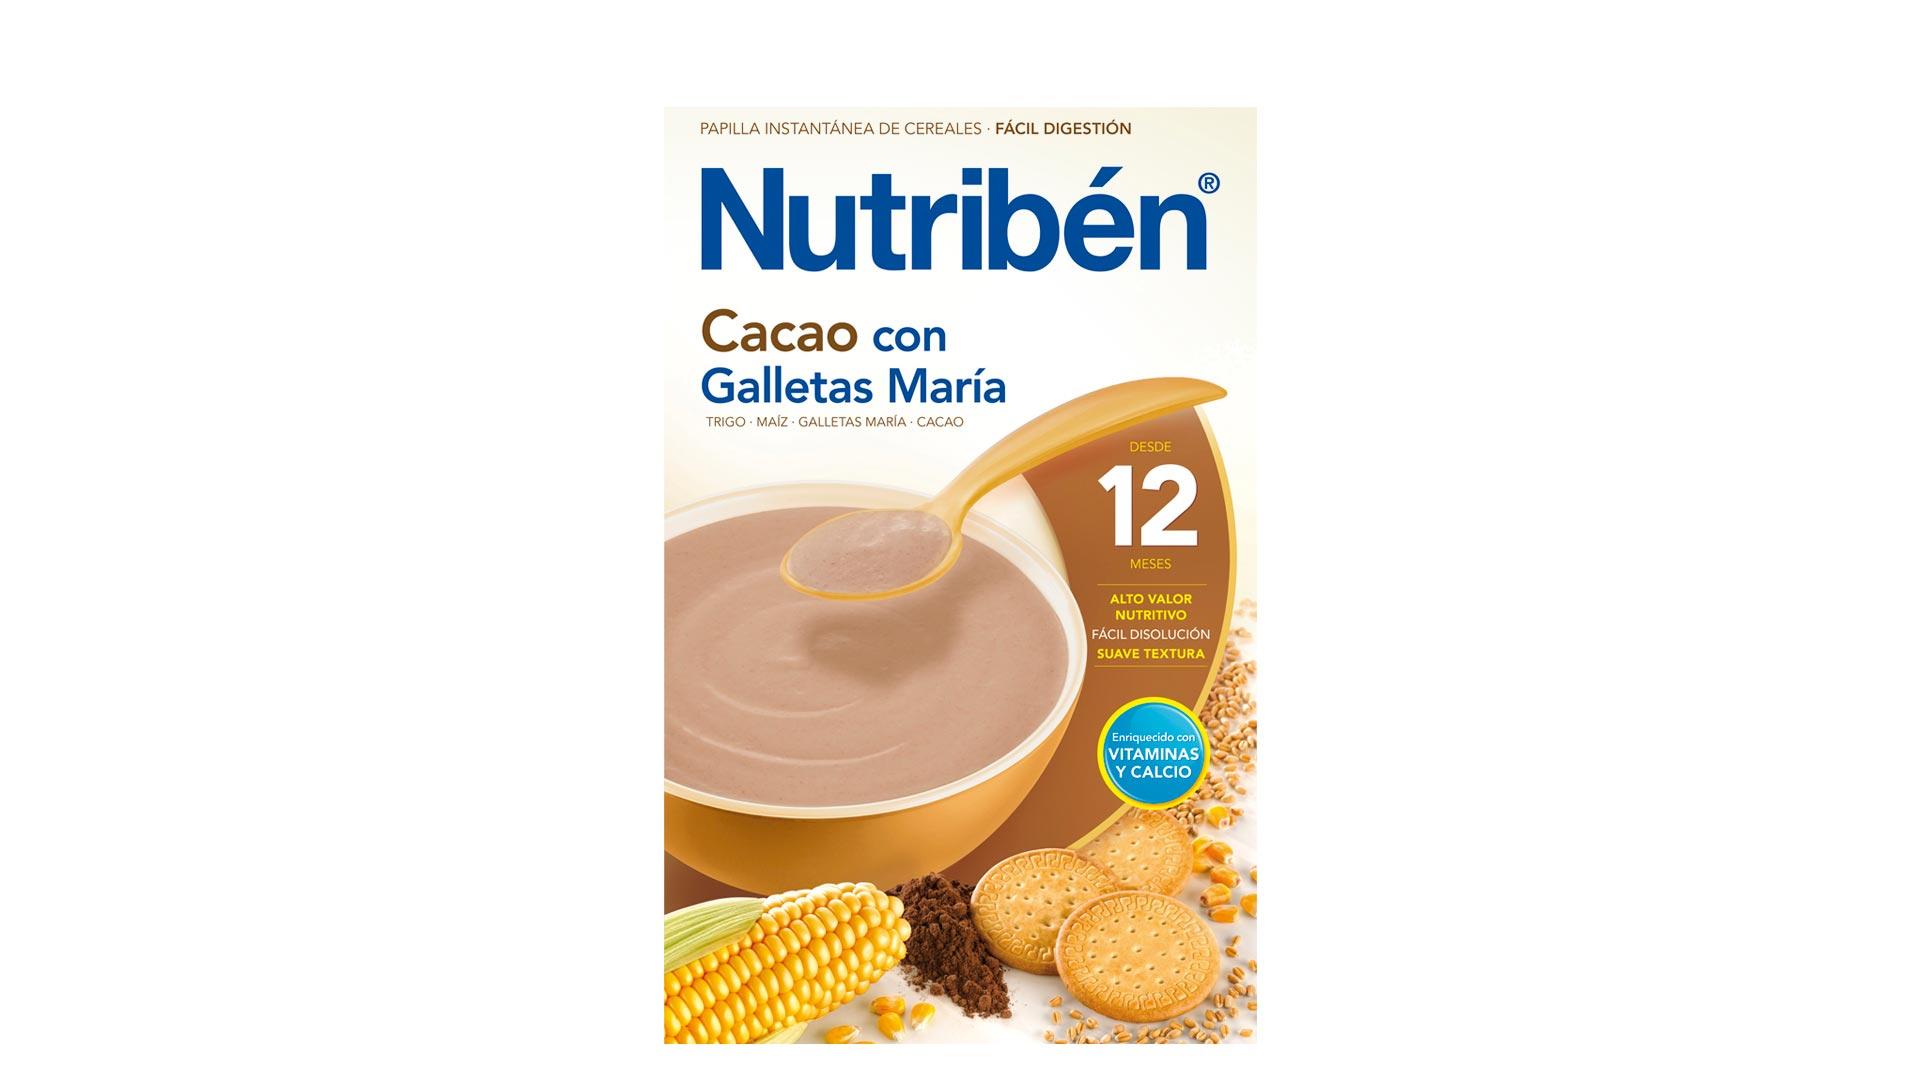 pk_f3p2d-nutriben-01